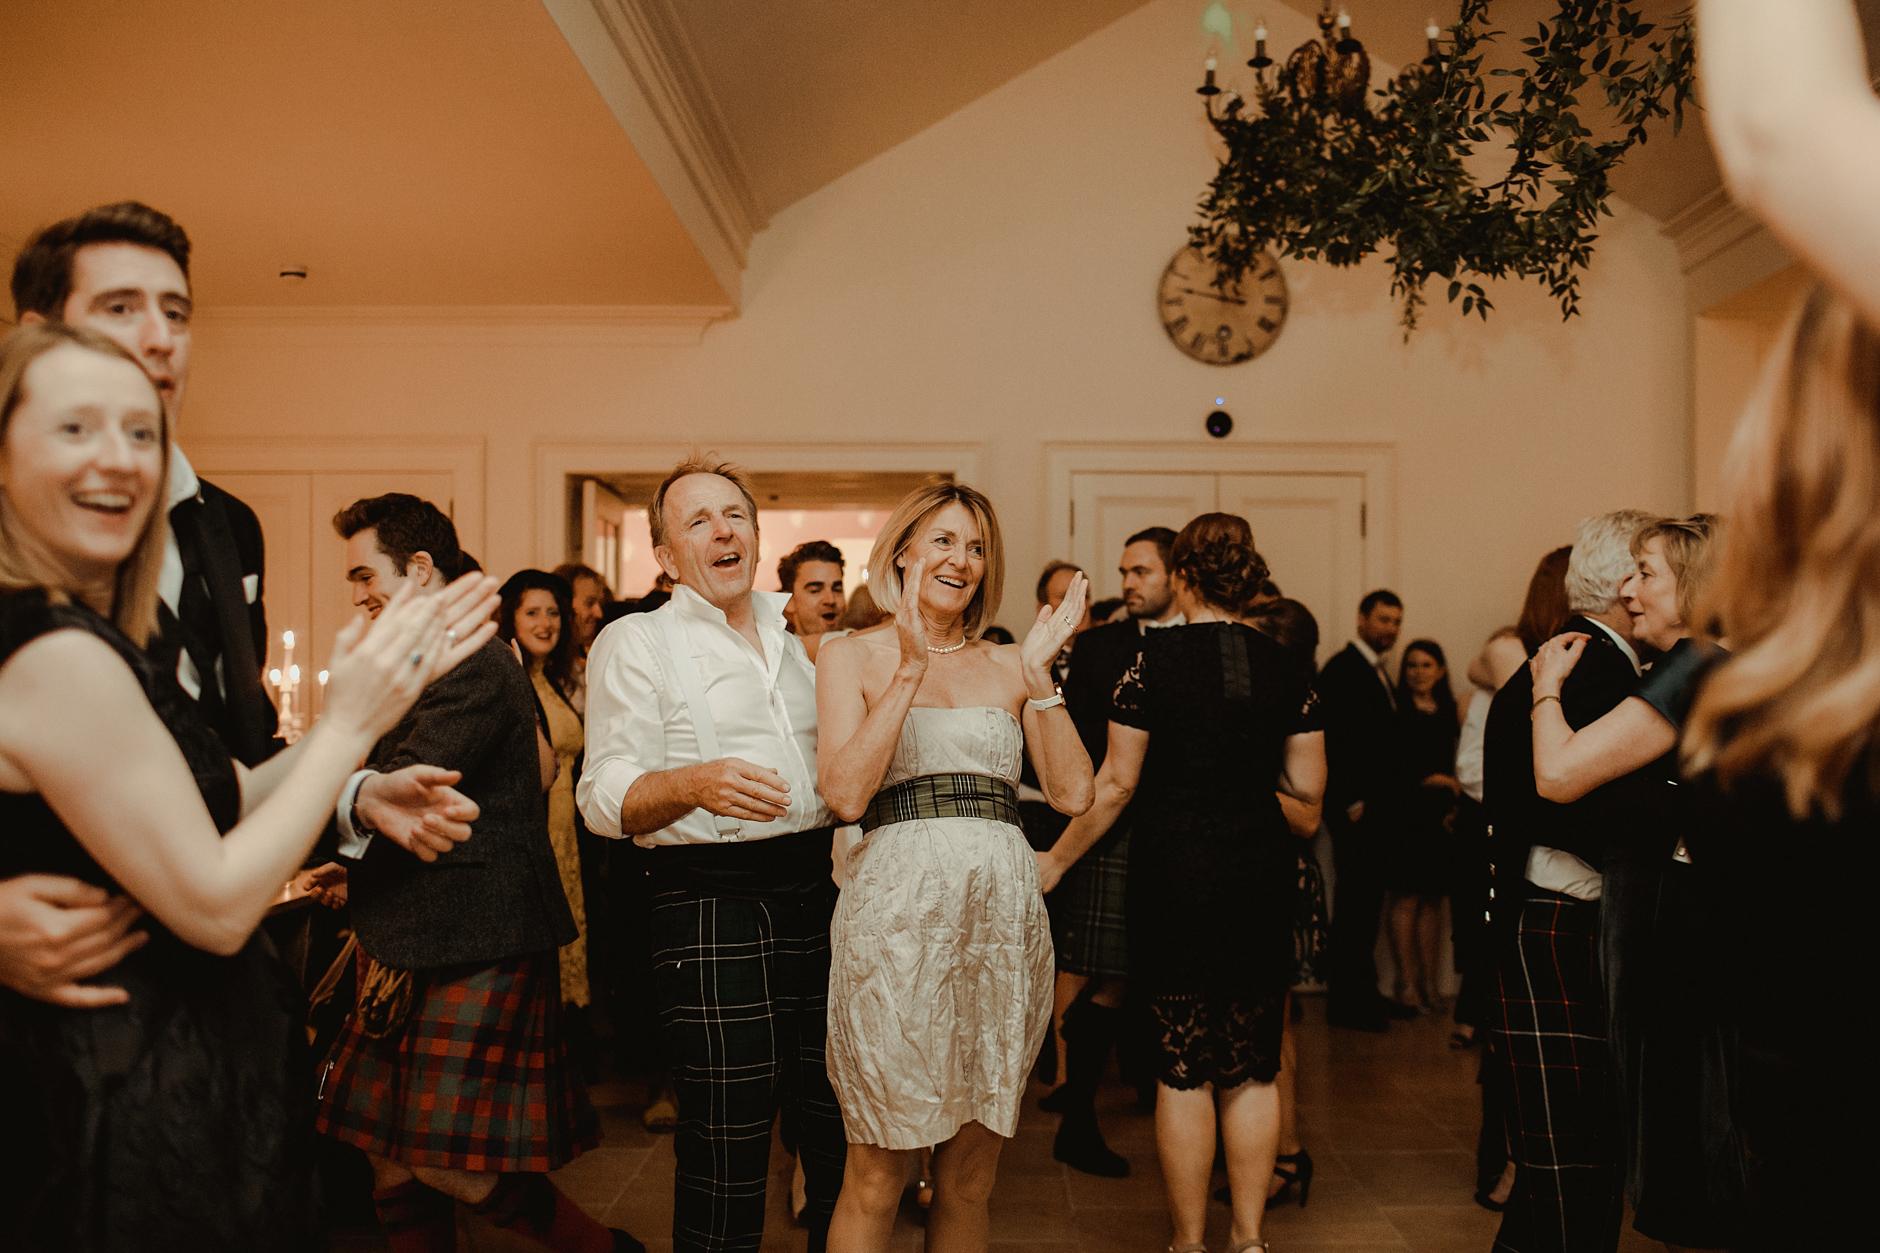 Glentruim-Wedding-Nikki-Leadbetter-Photography-372.jpg